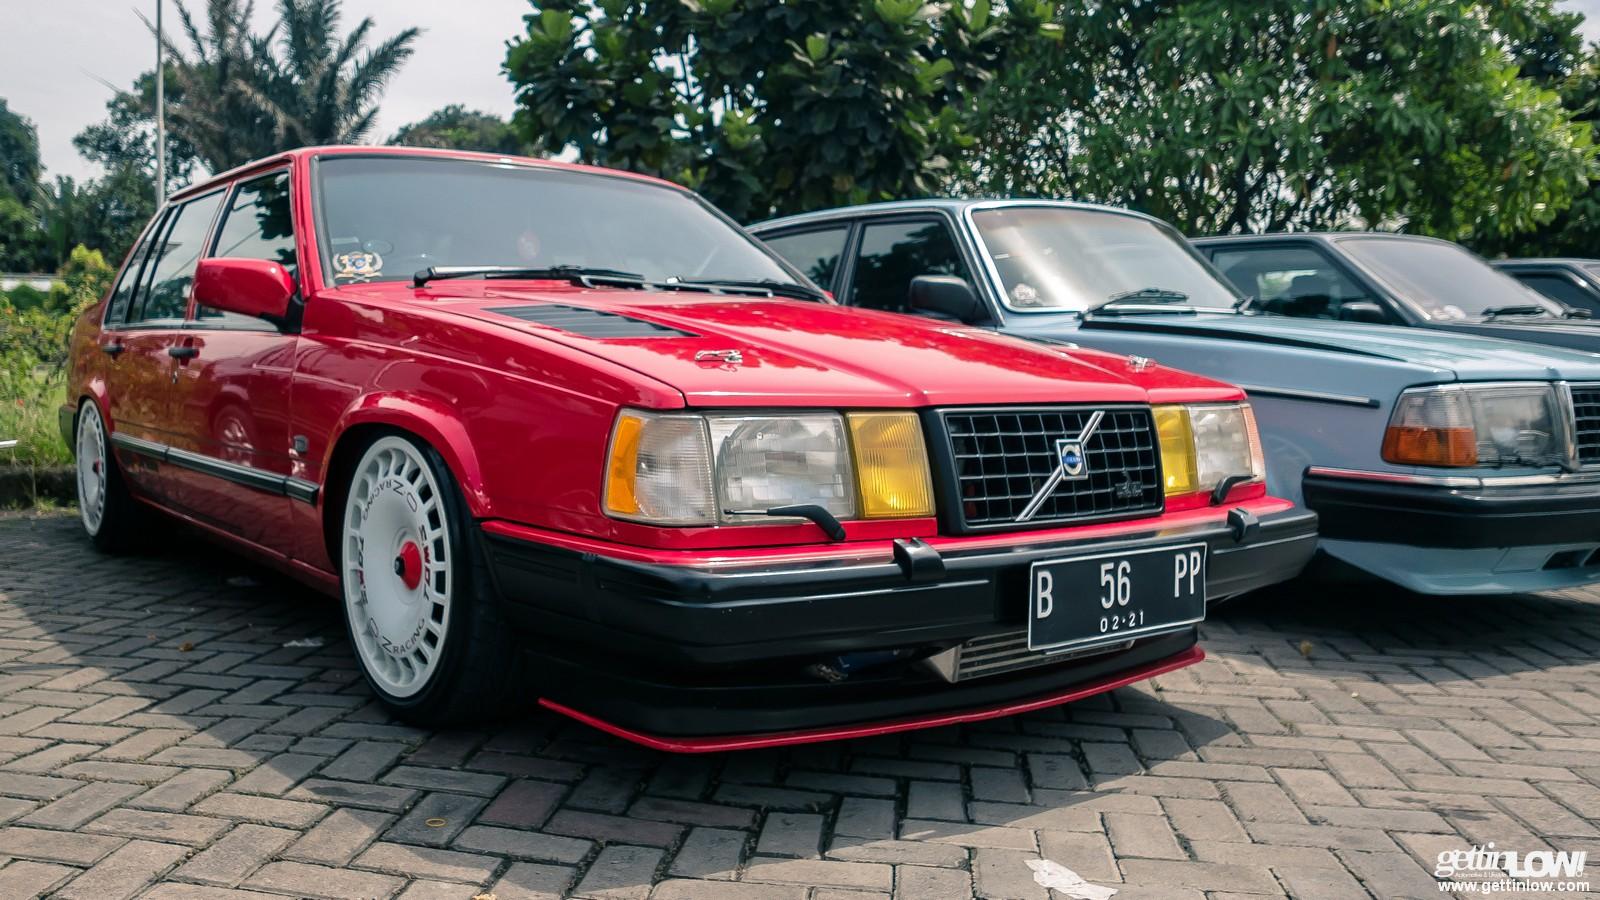 Image Result For Honda Grand Civic Club Indonesia